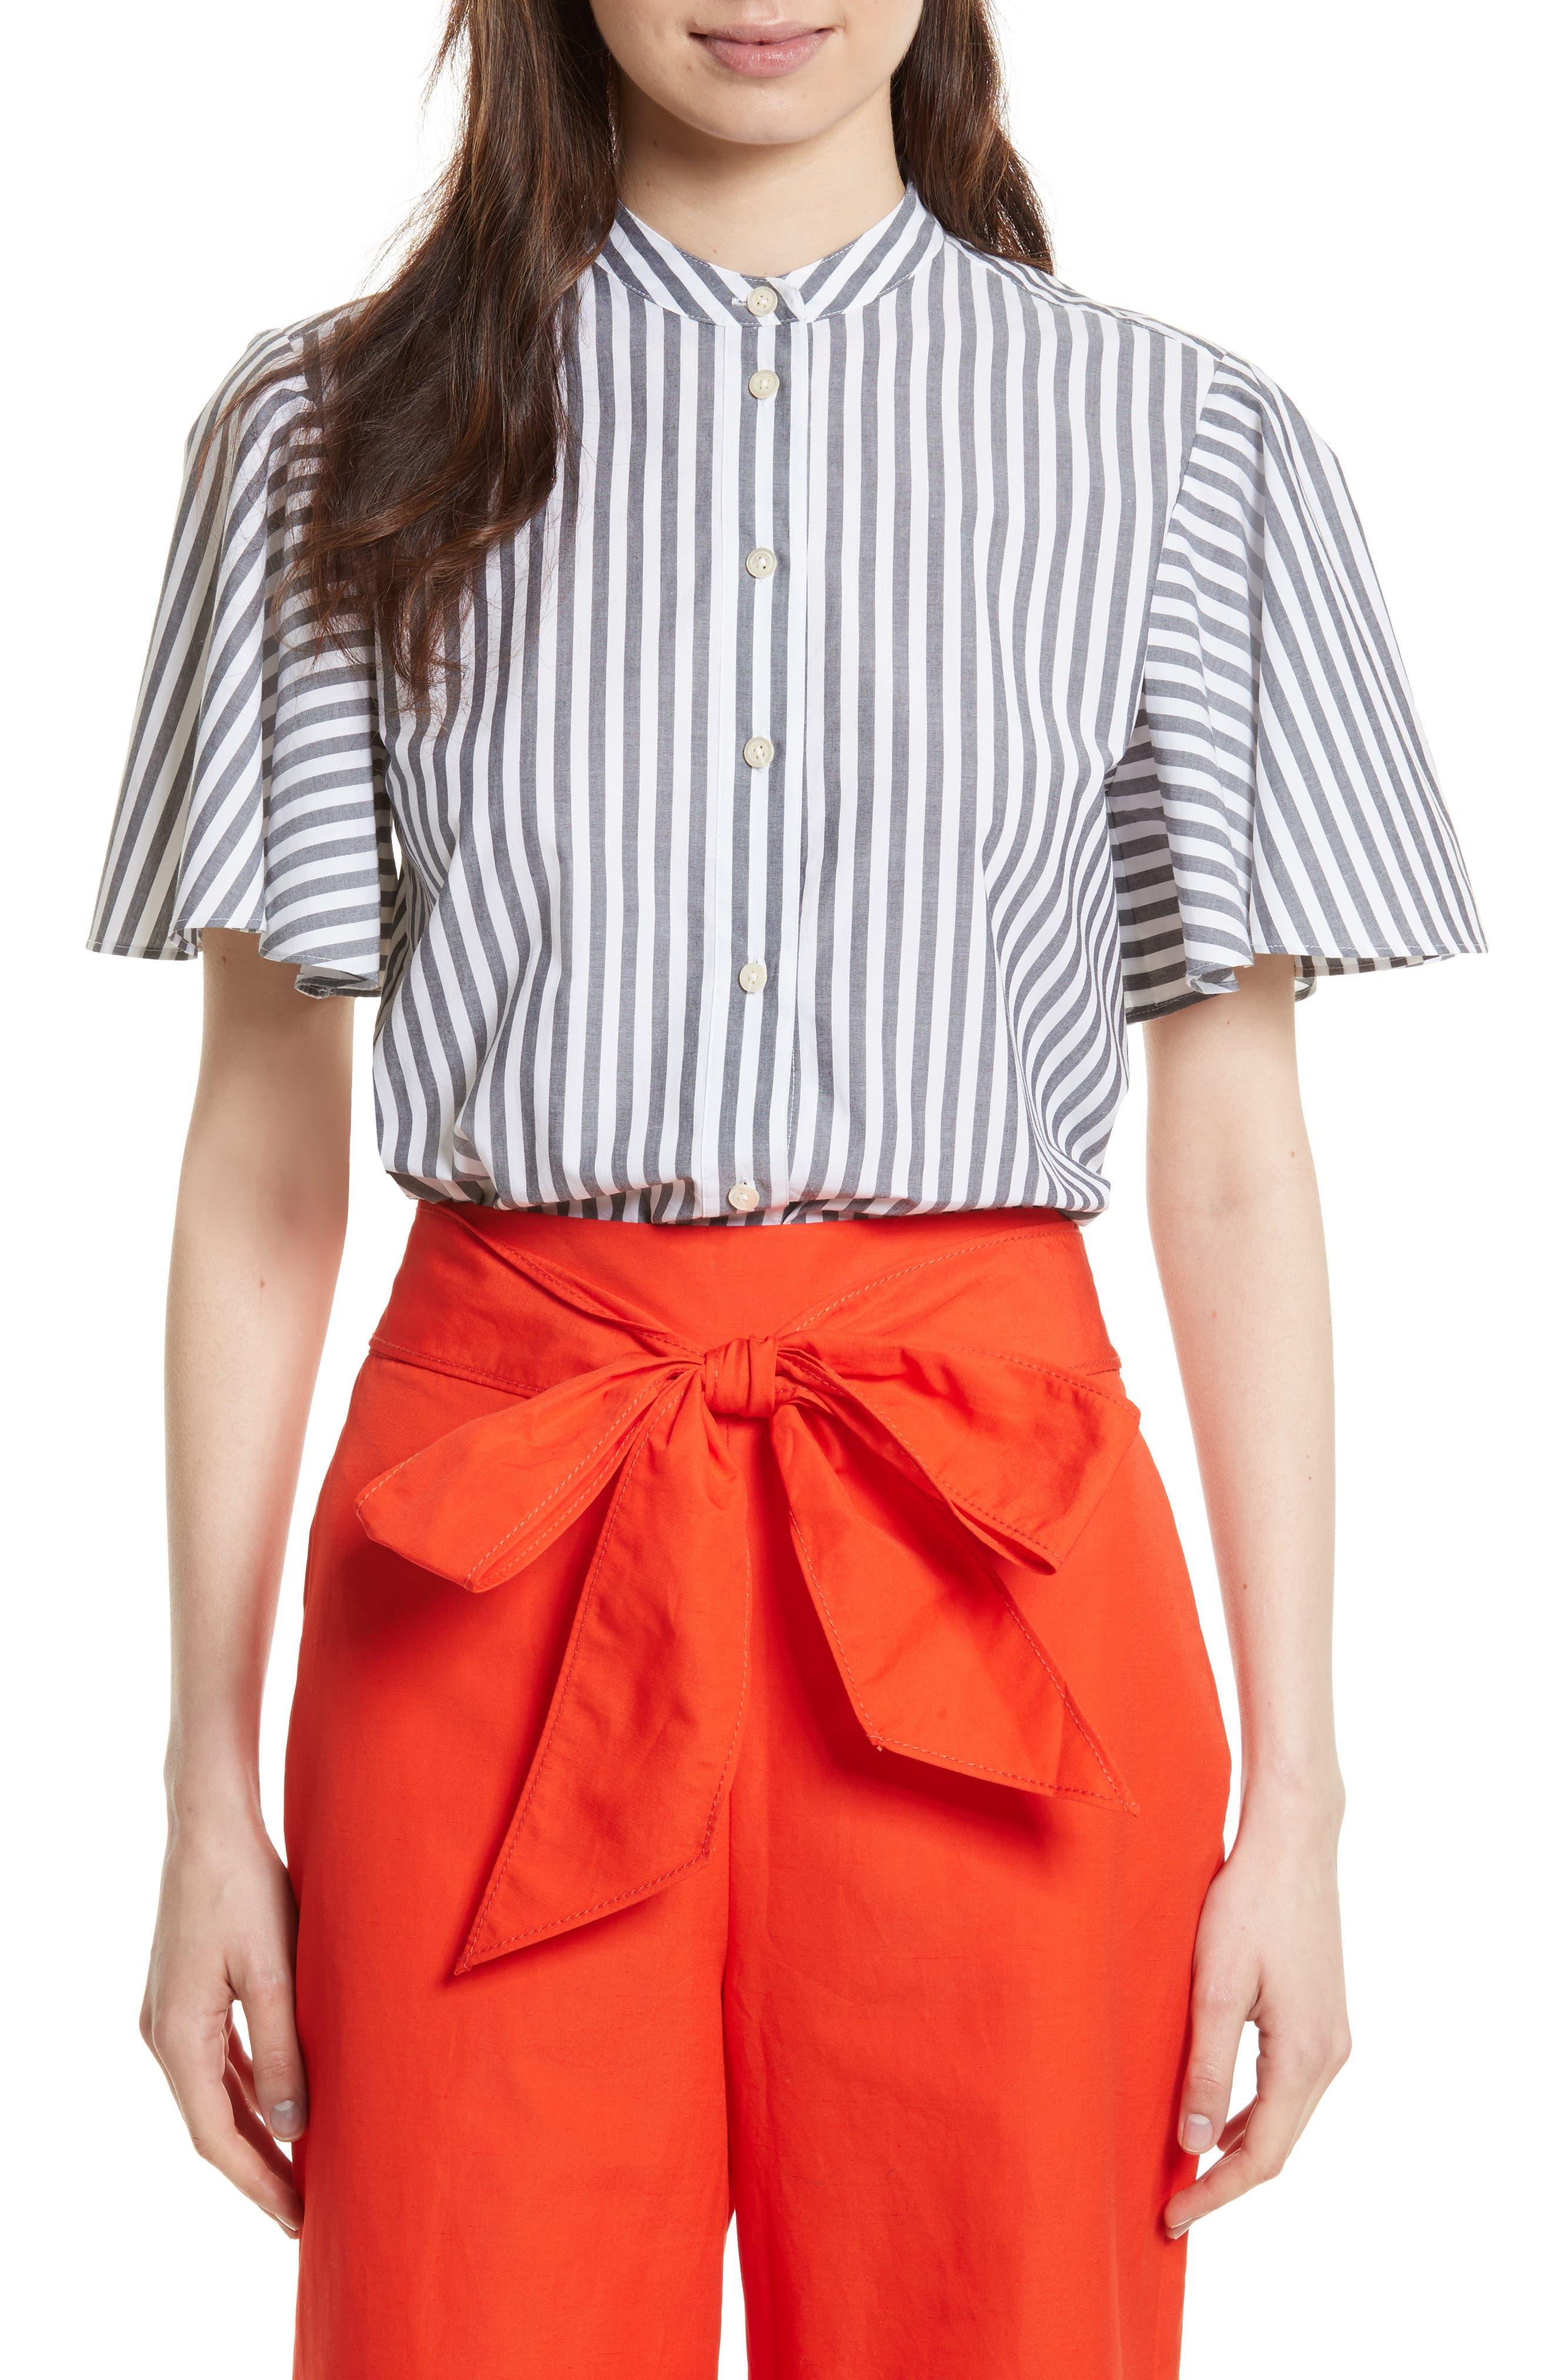 kate spade new york stripe cotton top